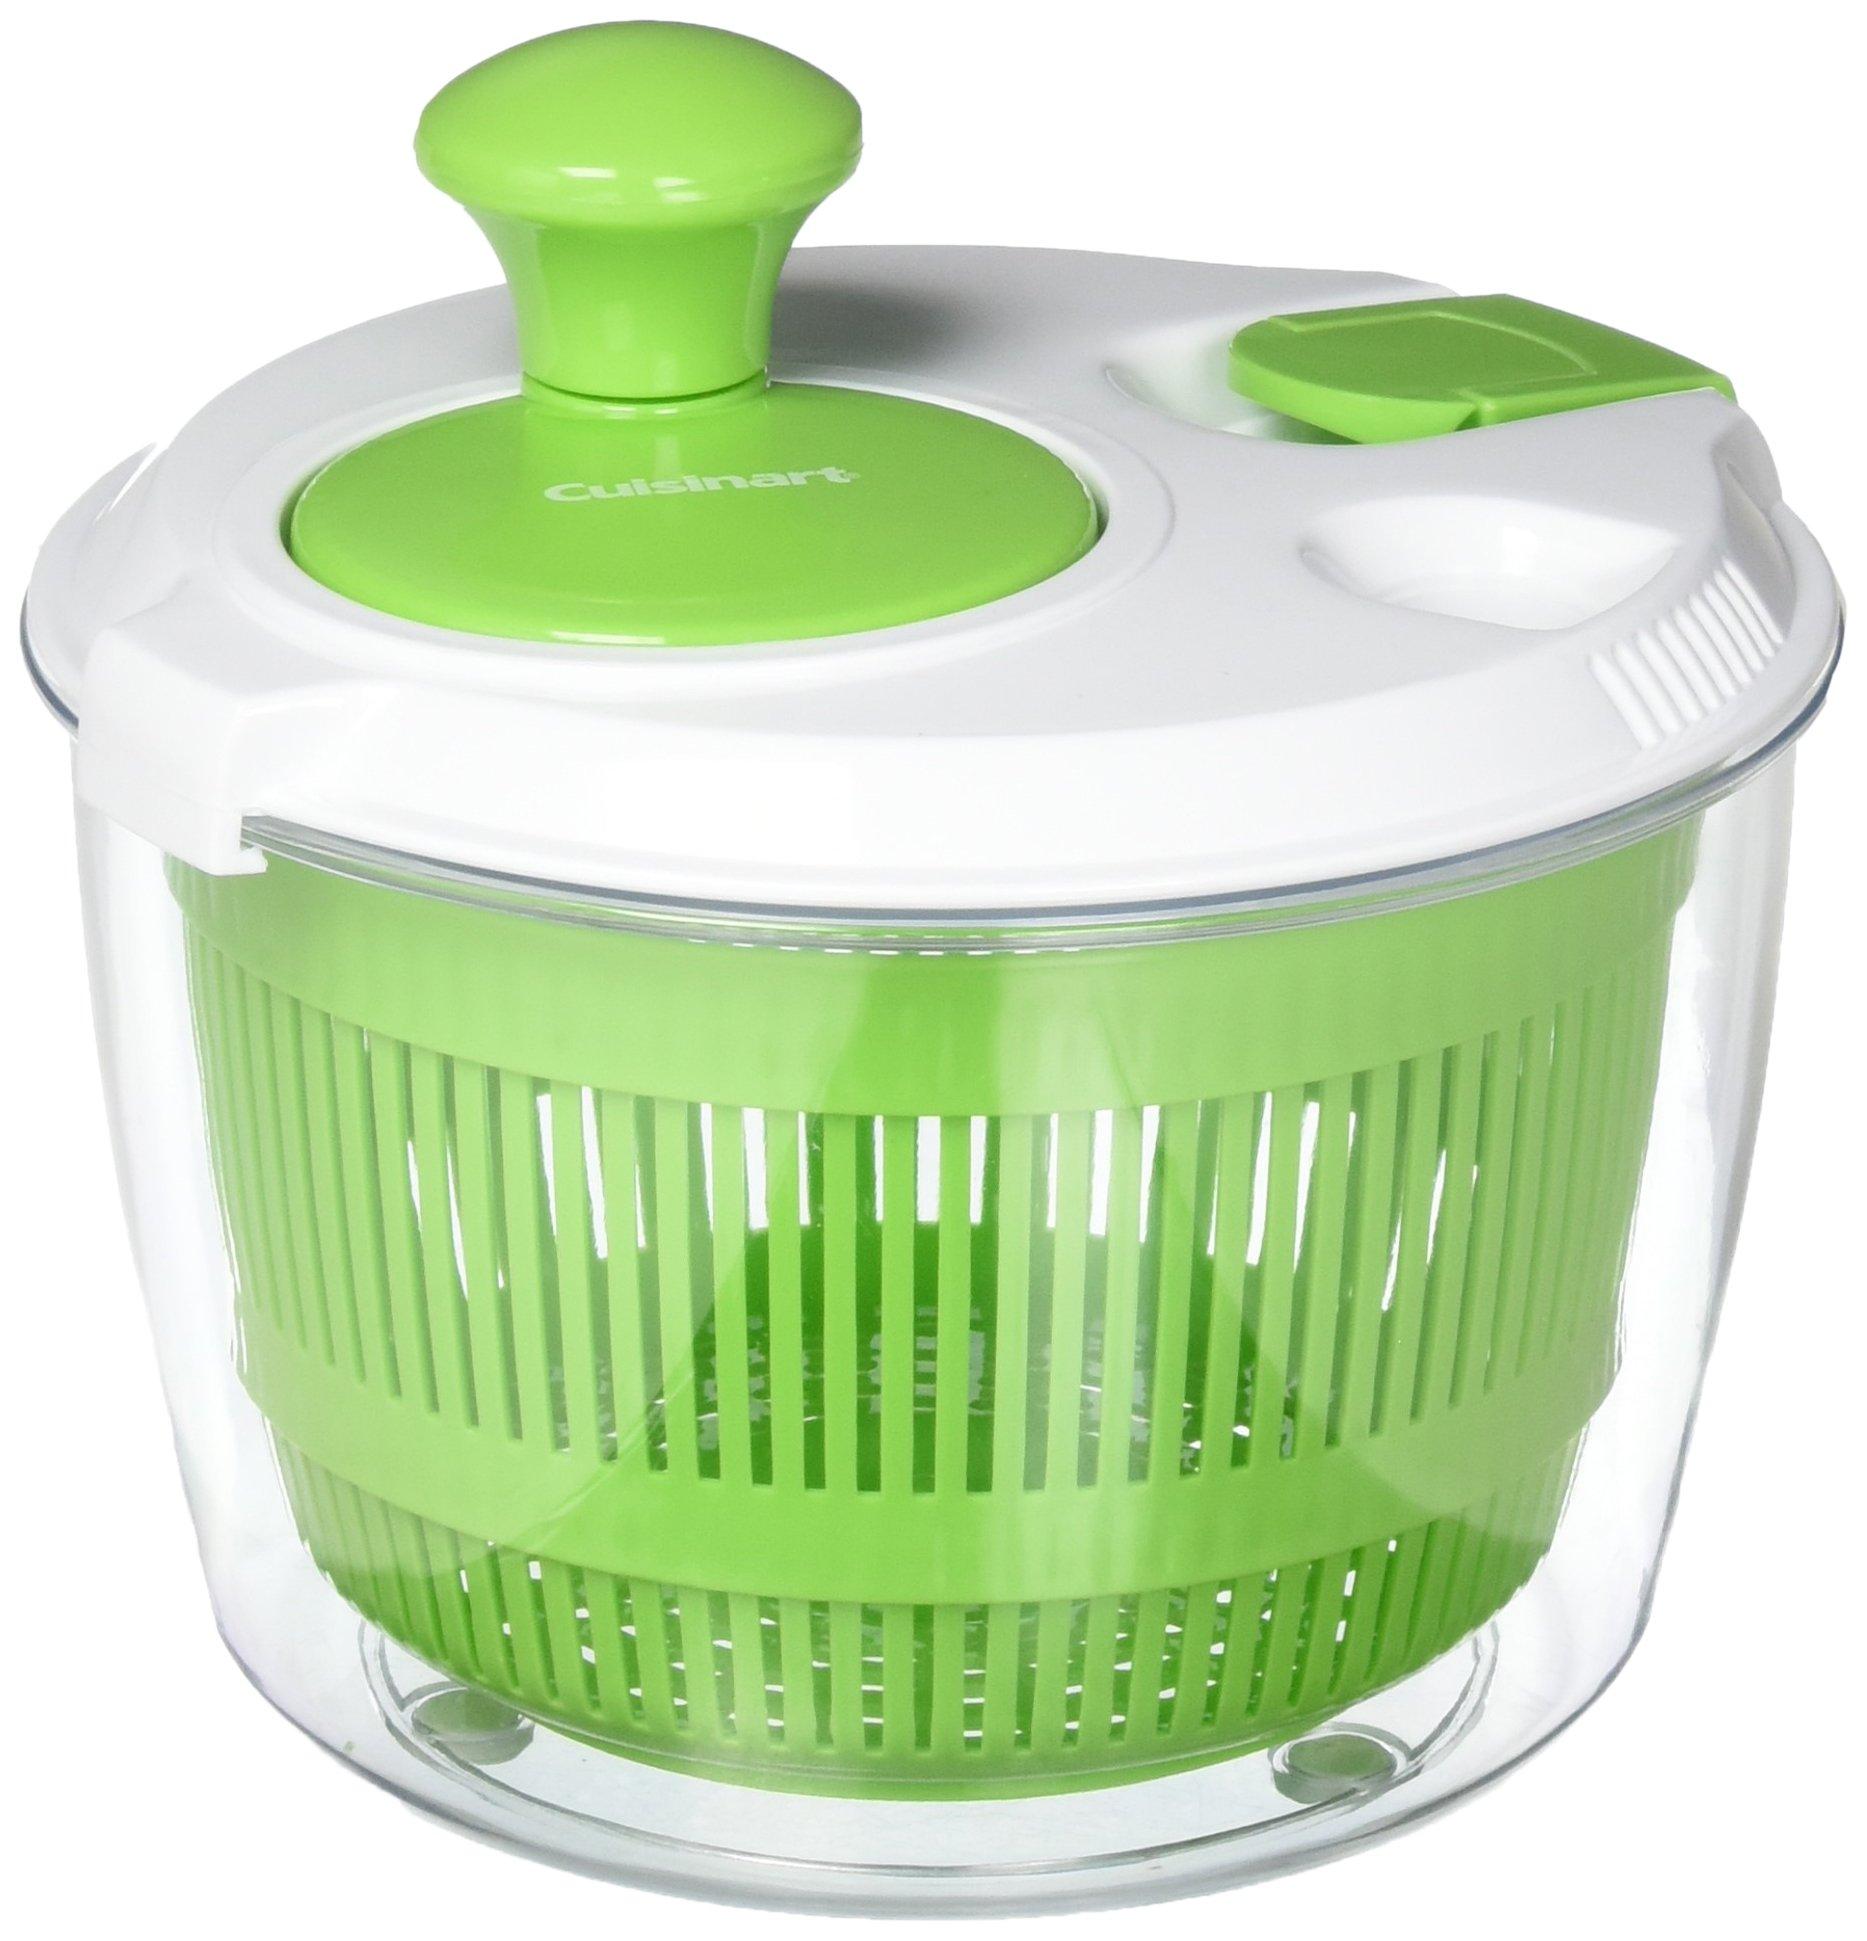 Cuisinart CTG-00-SSAS Salad Spinner, Green by Cuisinart